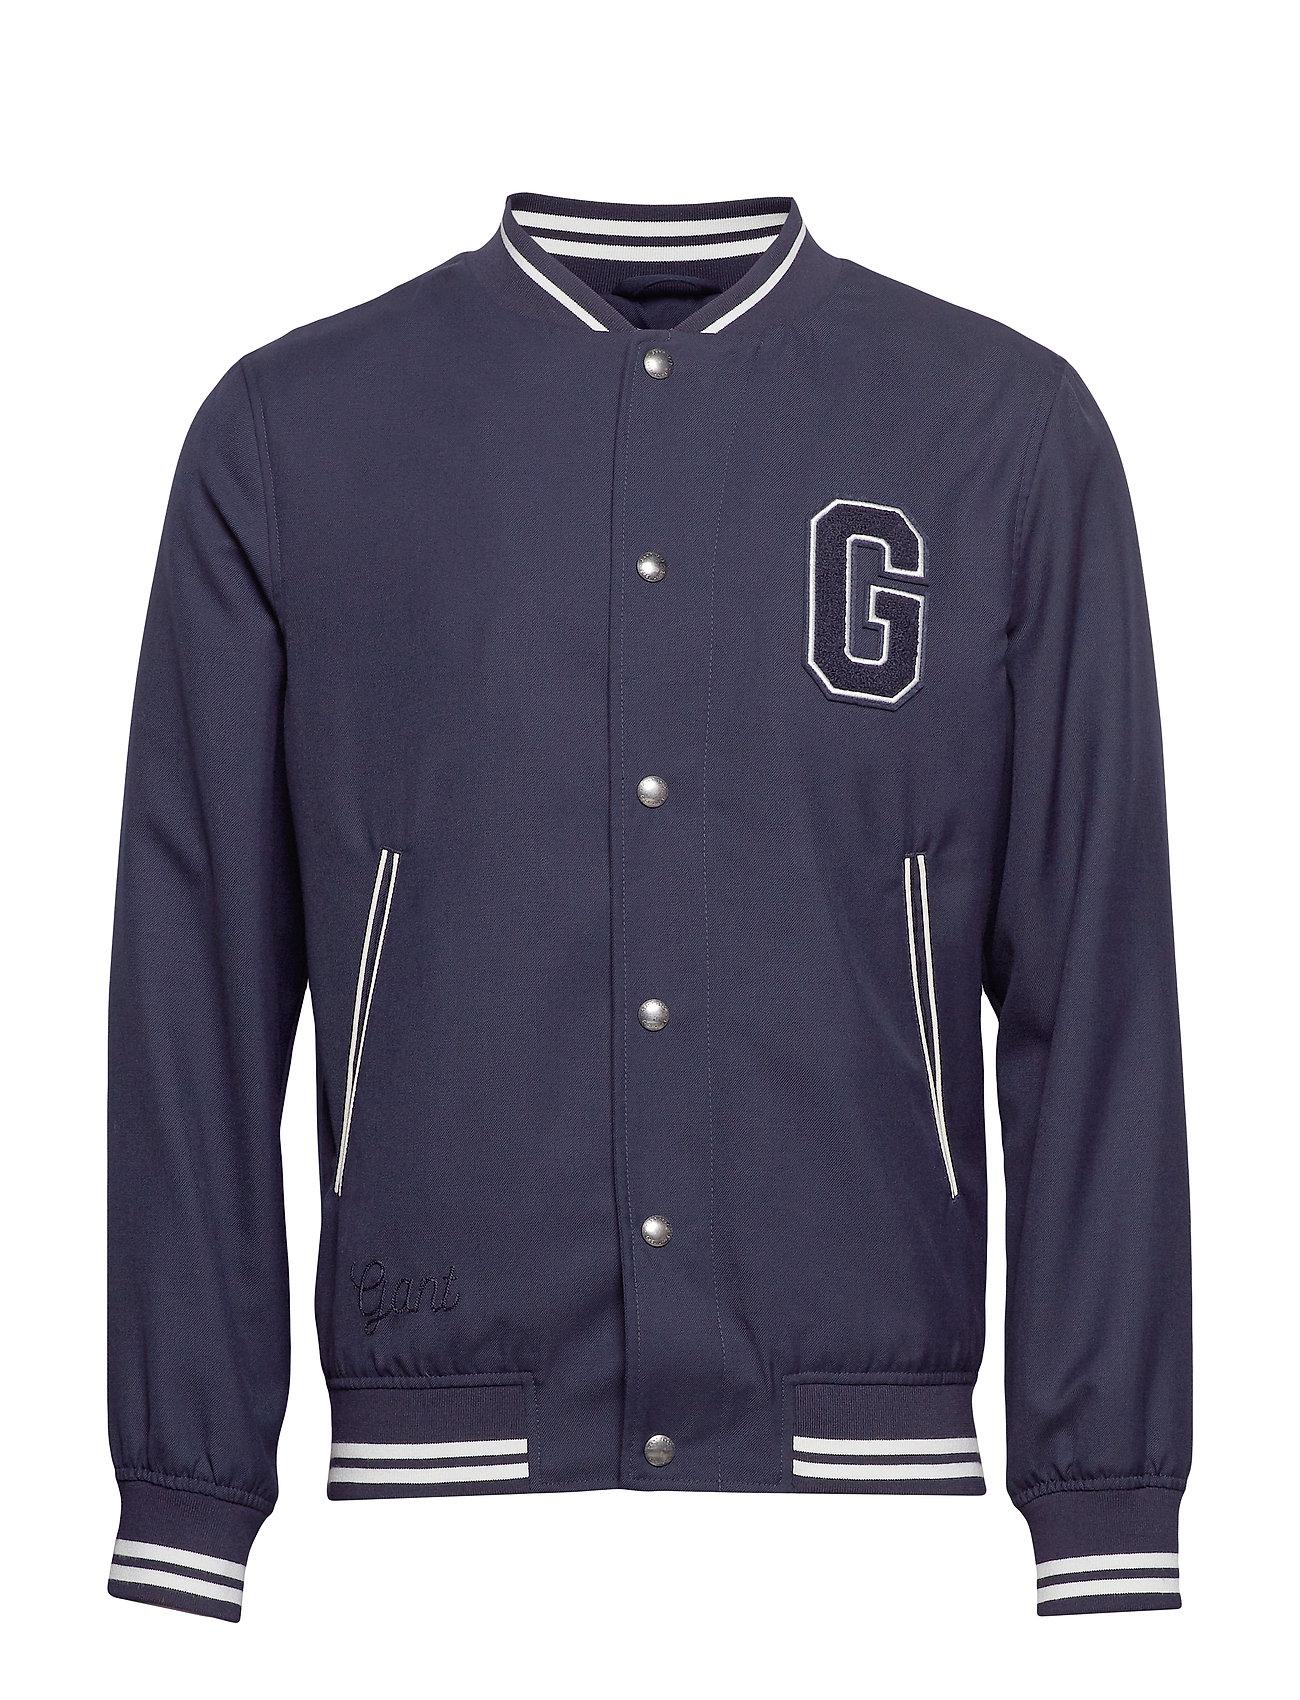 Gant O1. THE GANT ICON VARSITY - EVENING BLUE